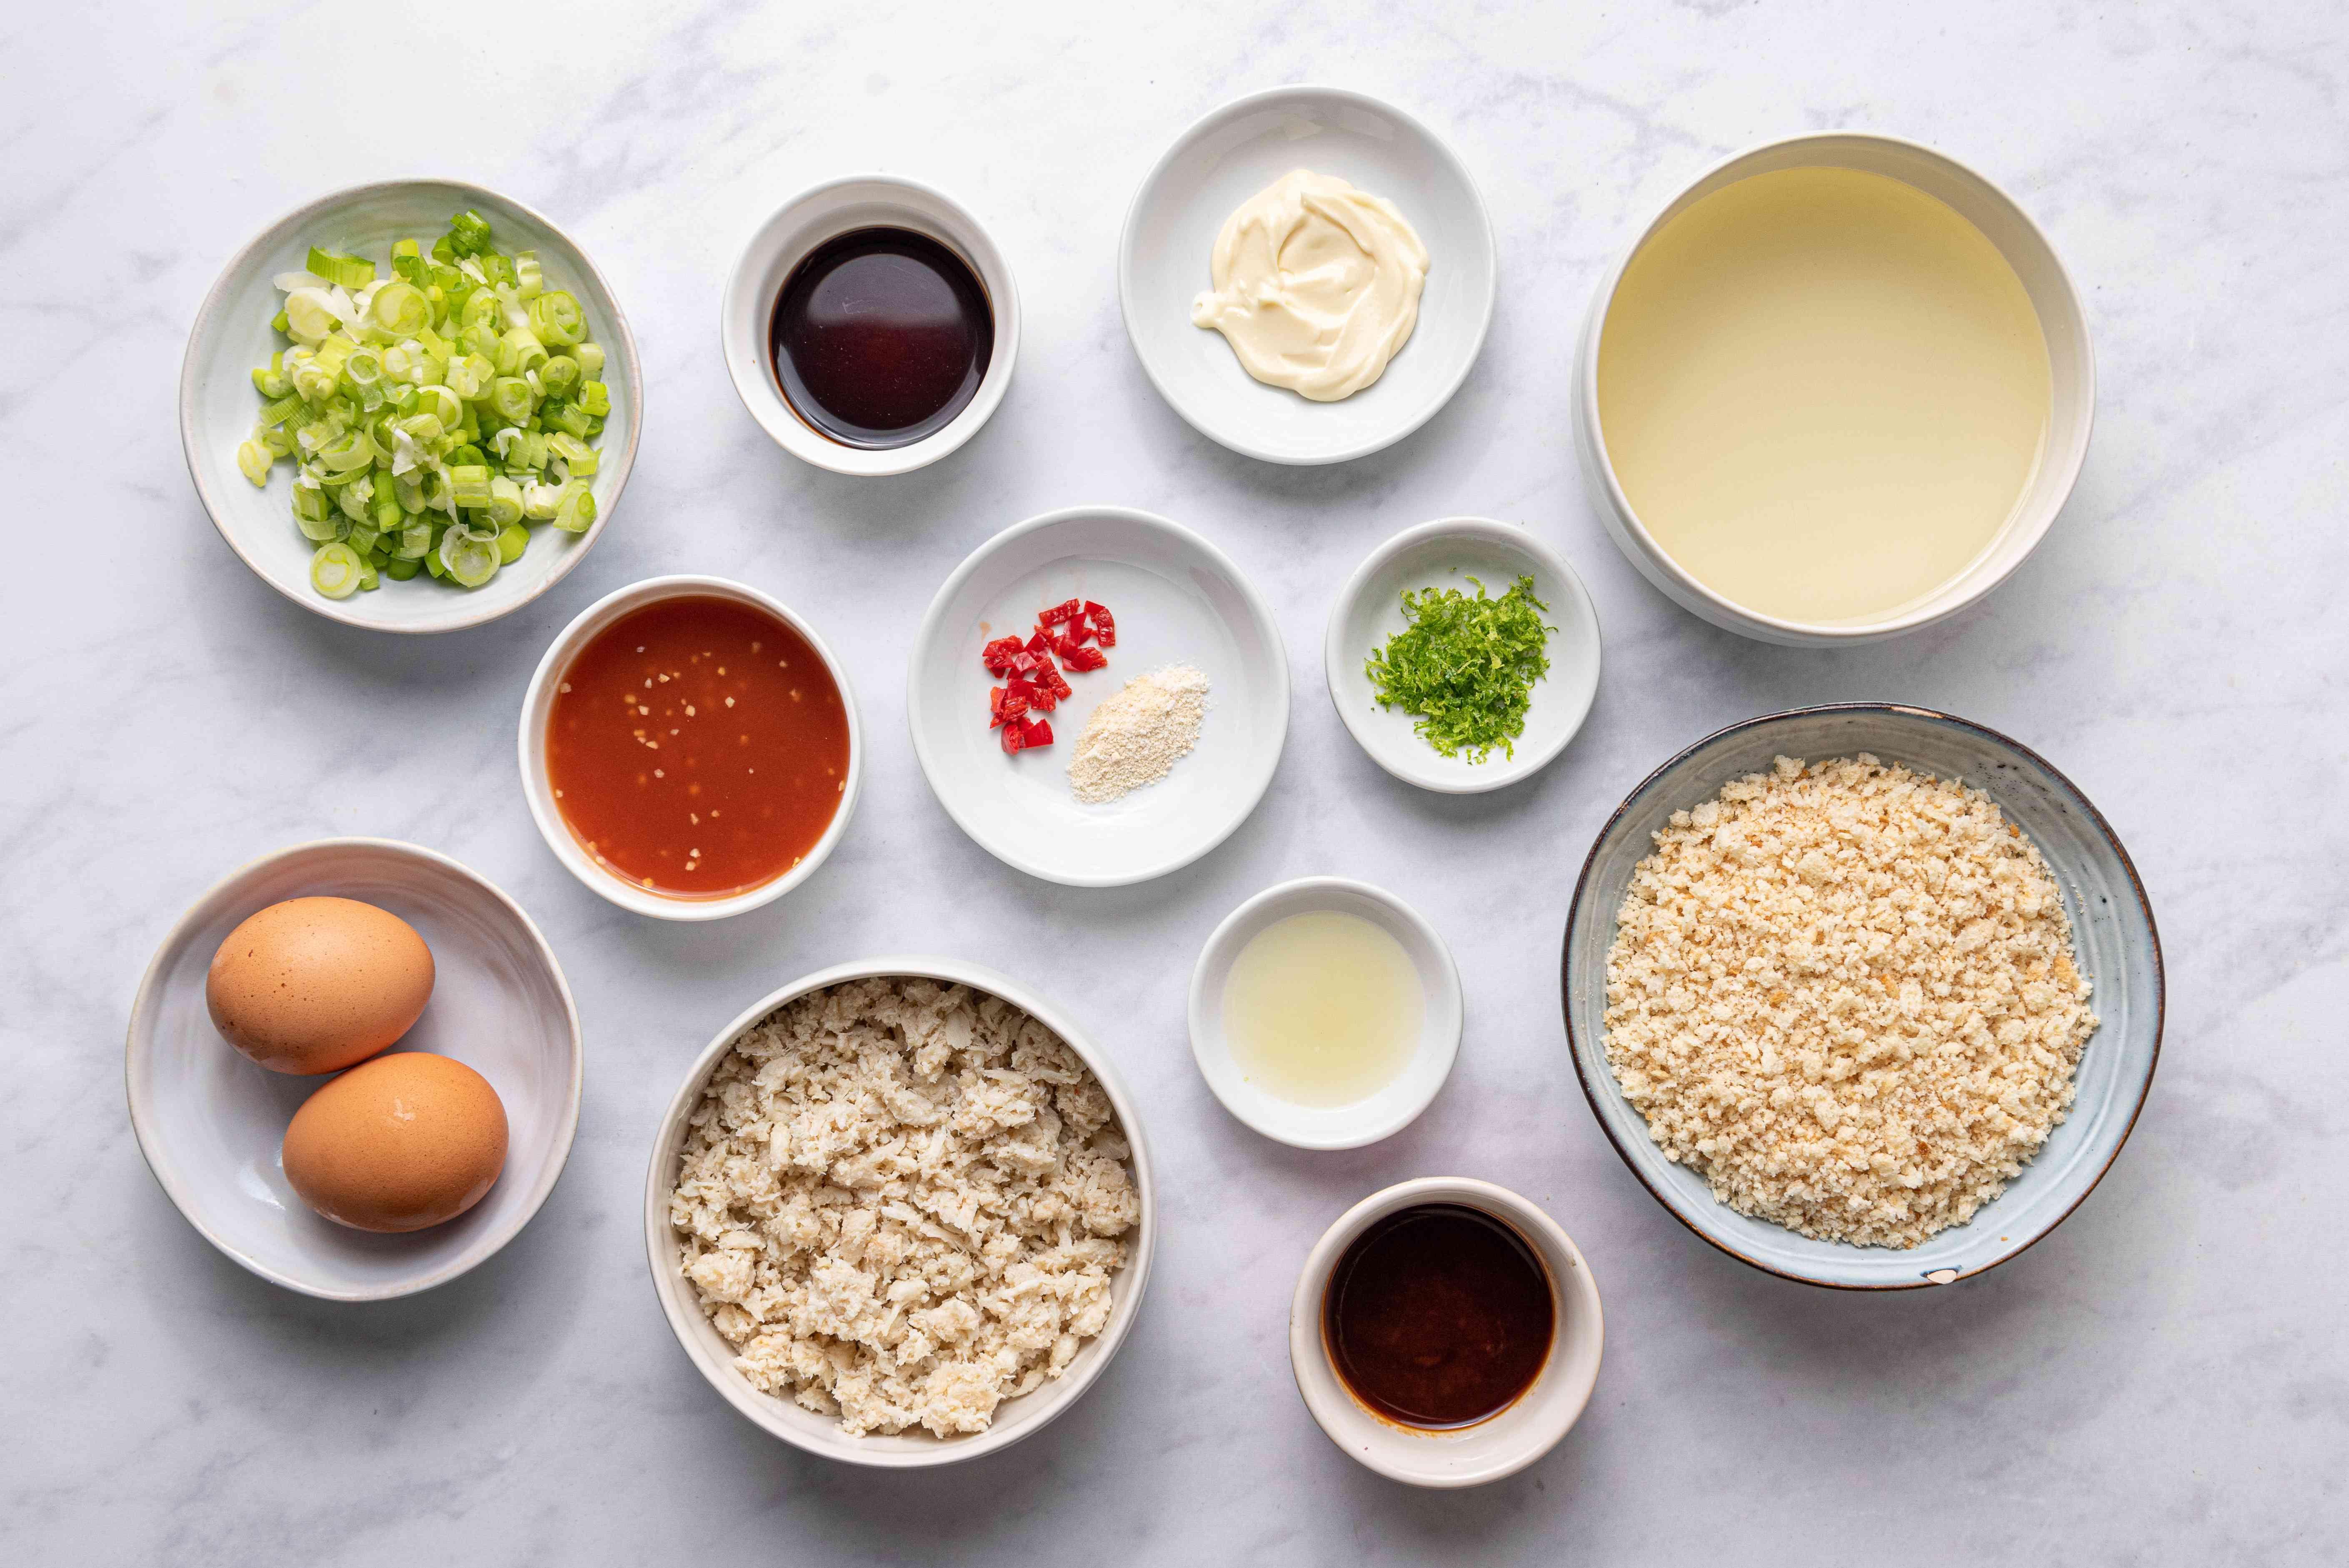 Thai Crab Cakes ingredients